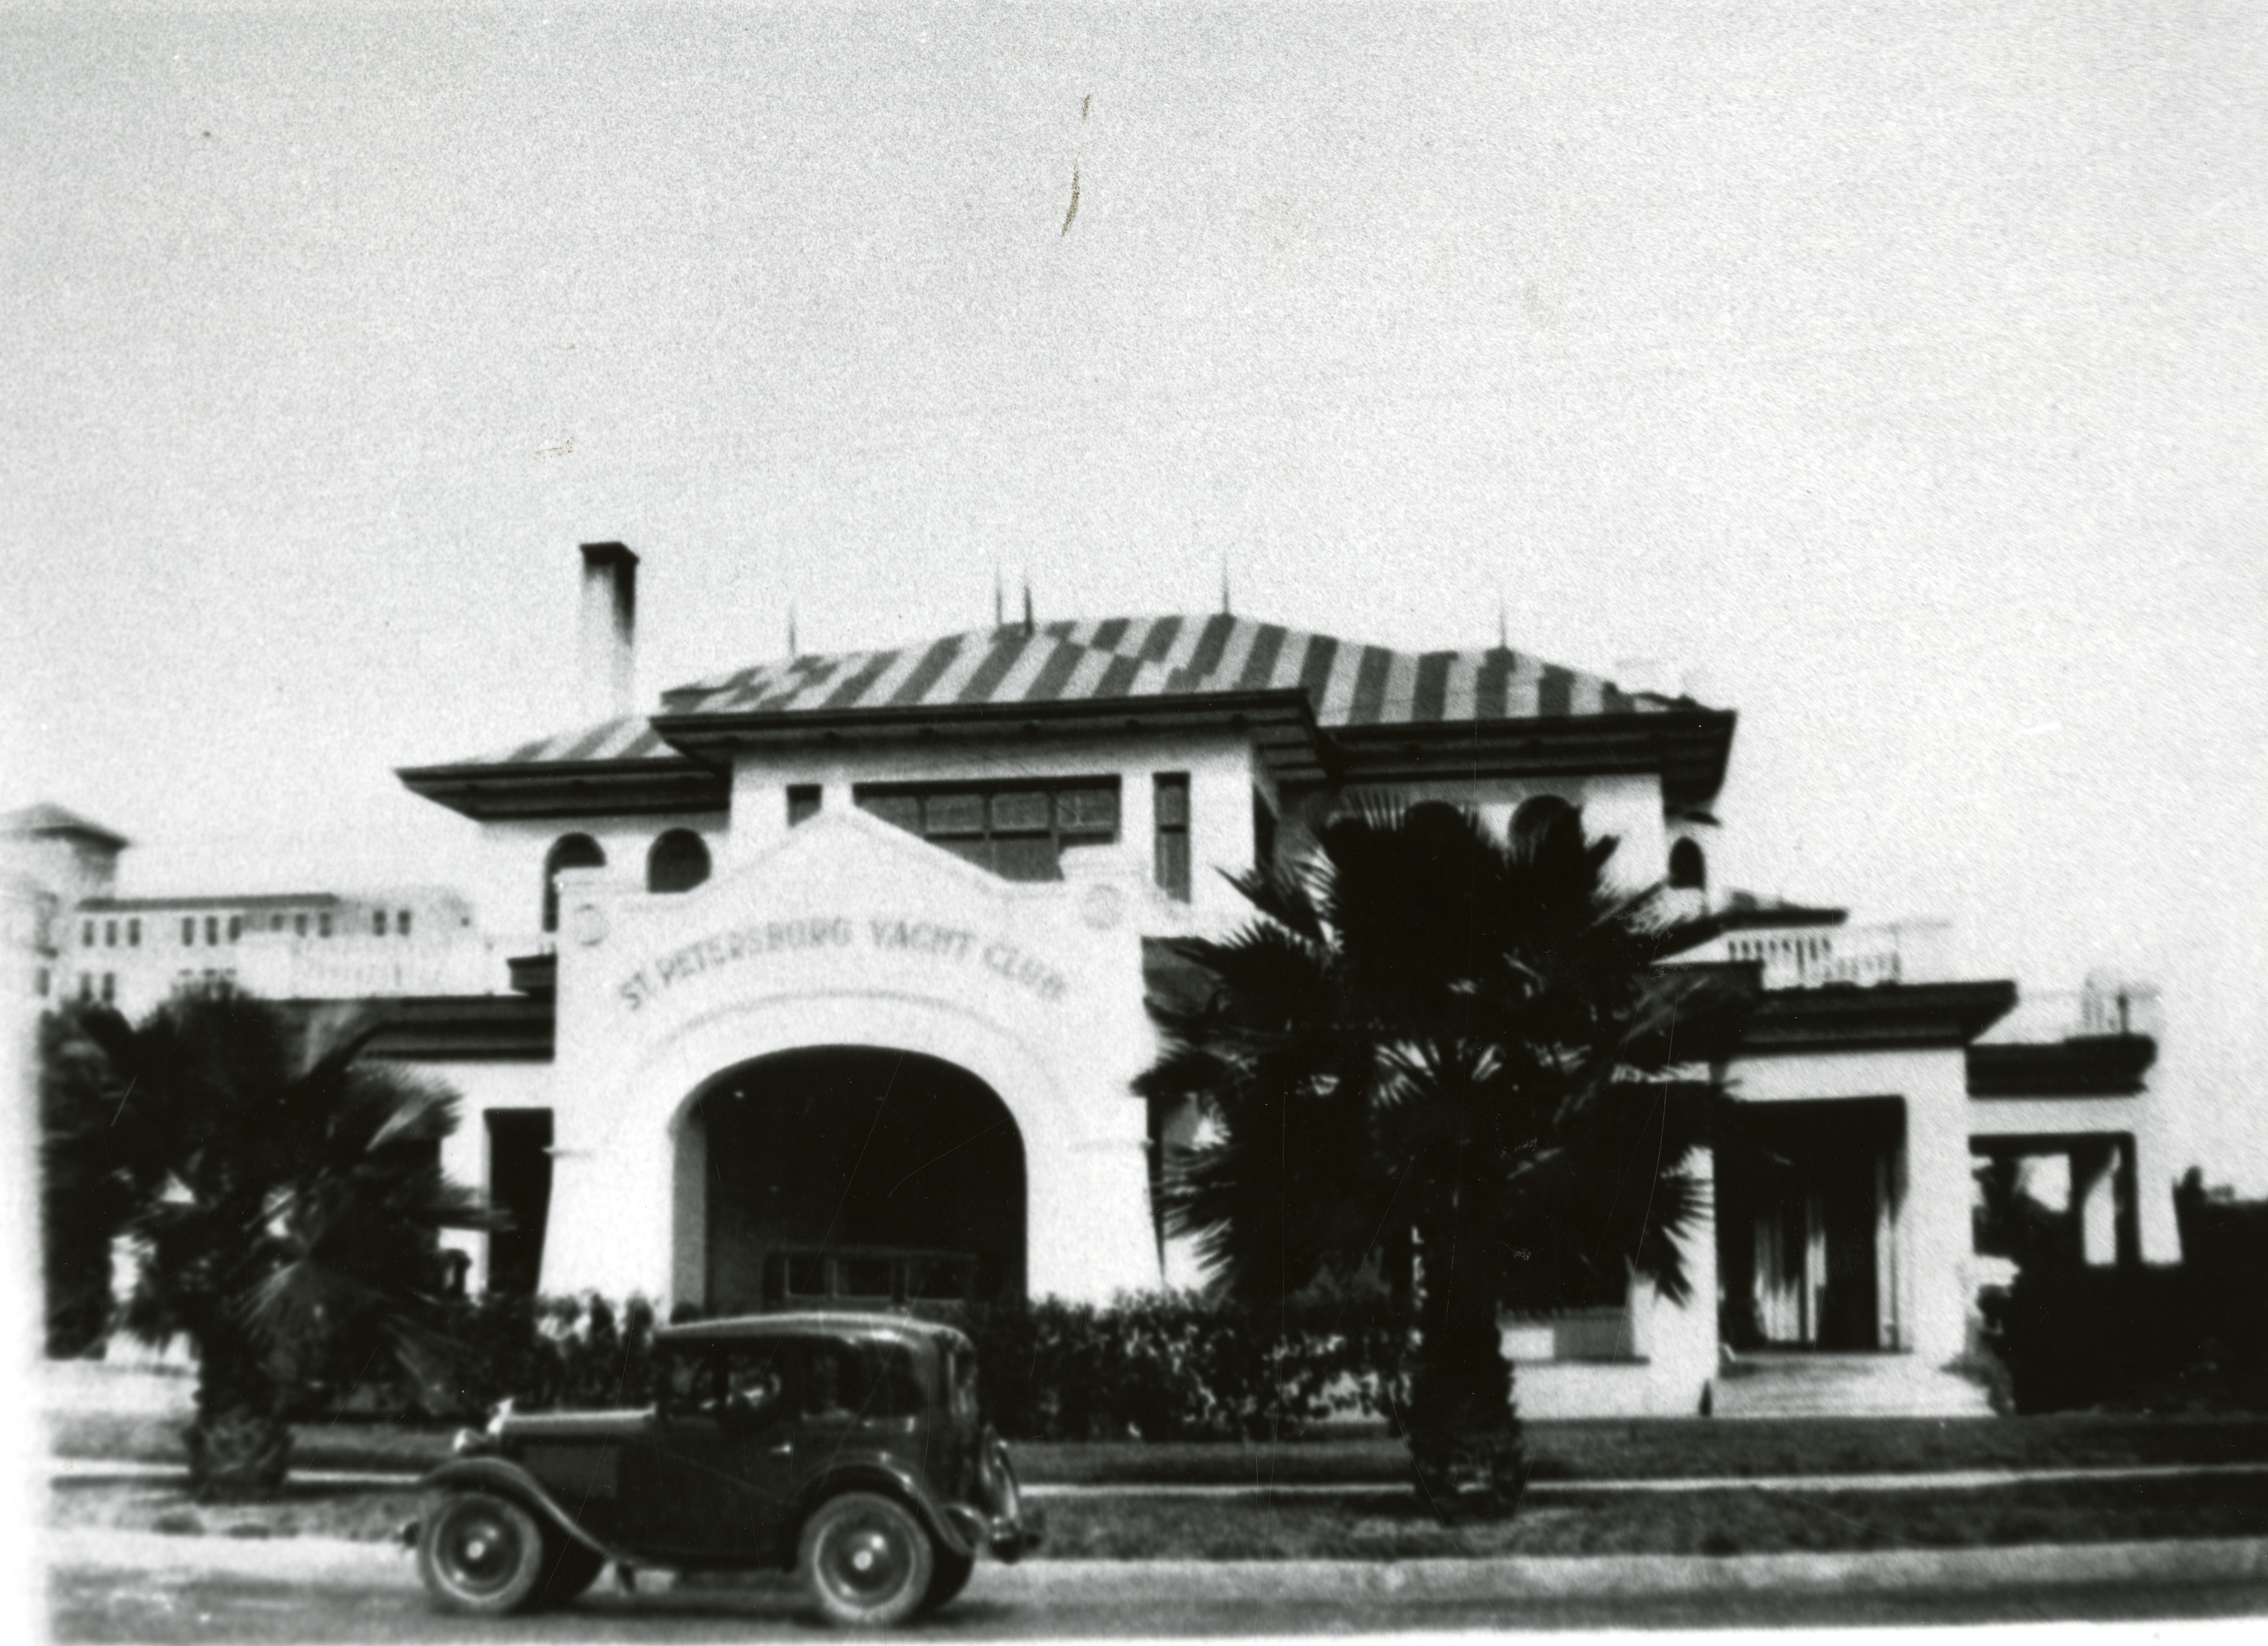 St. Petersburg Yacht Club, St. Petersburg, Florida, circa 1930.